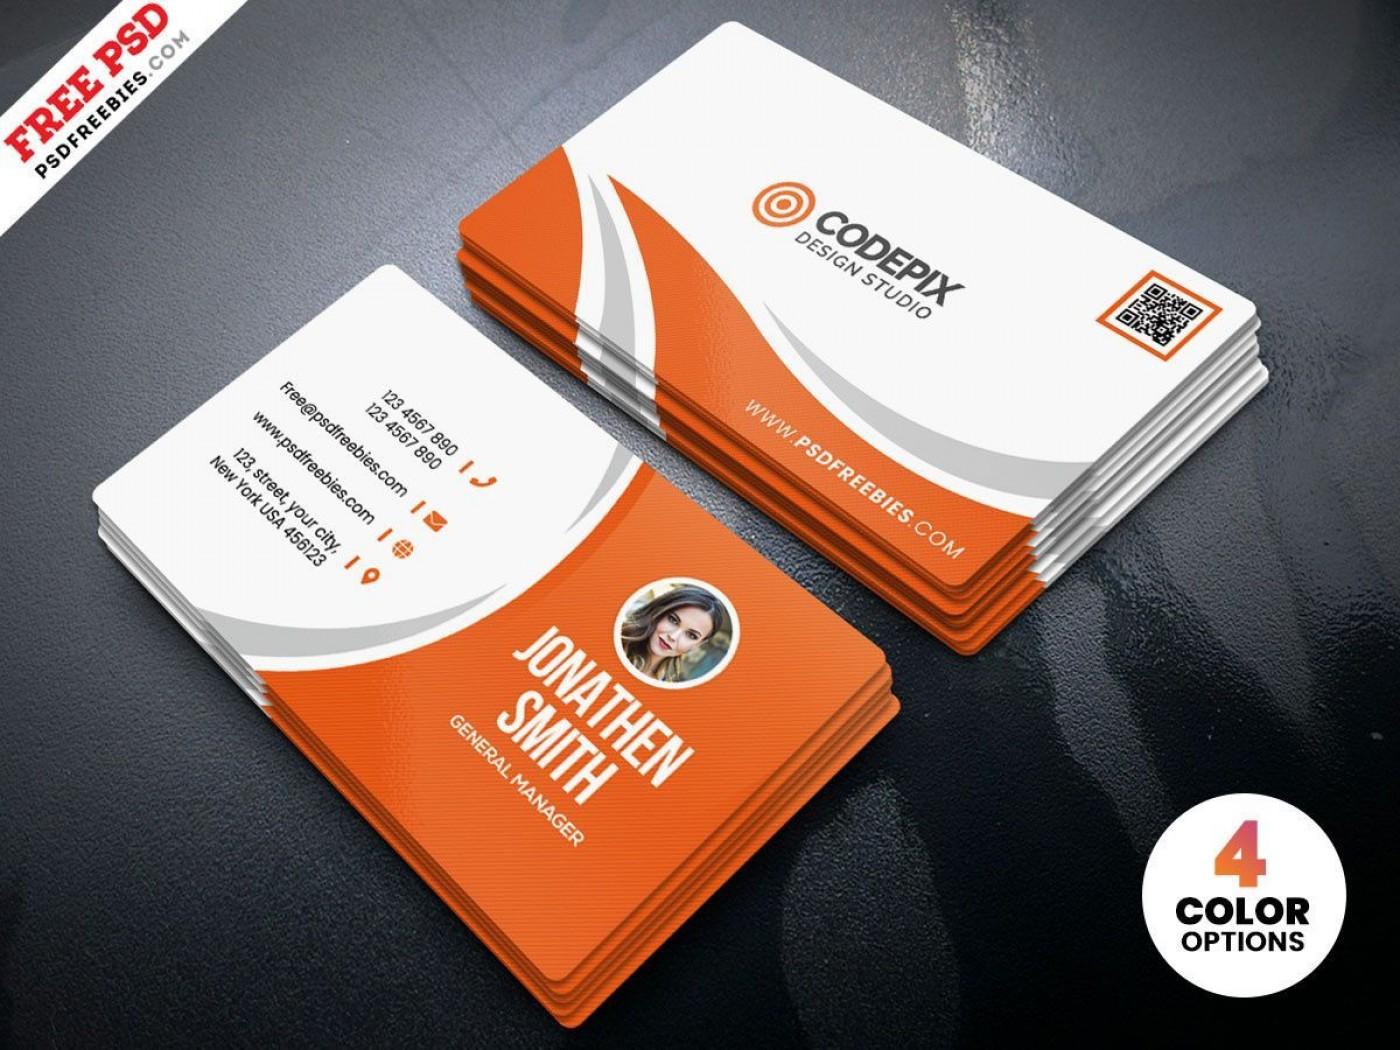 003 Singular Simple Busines Card Template Free Highest Quality  Minimalist Illustrator Design1400